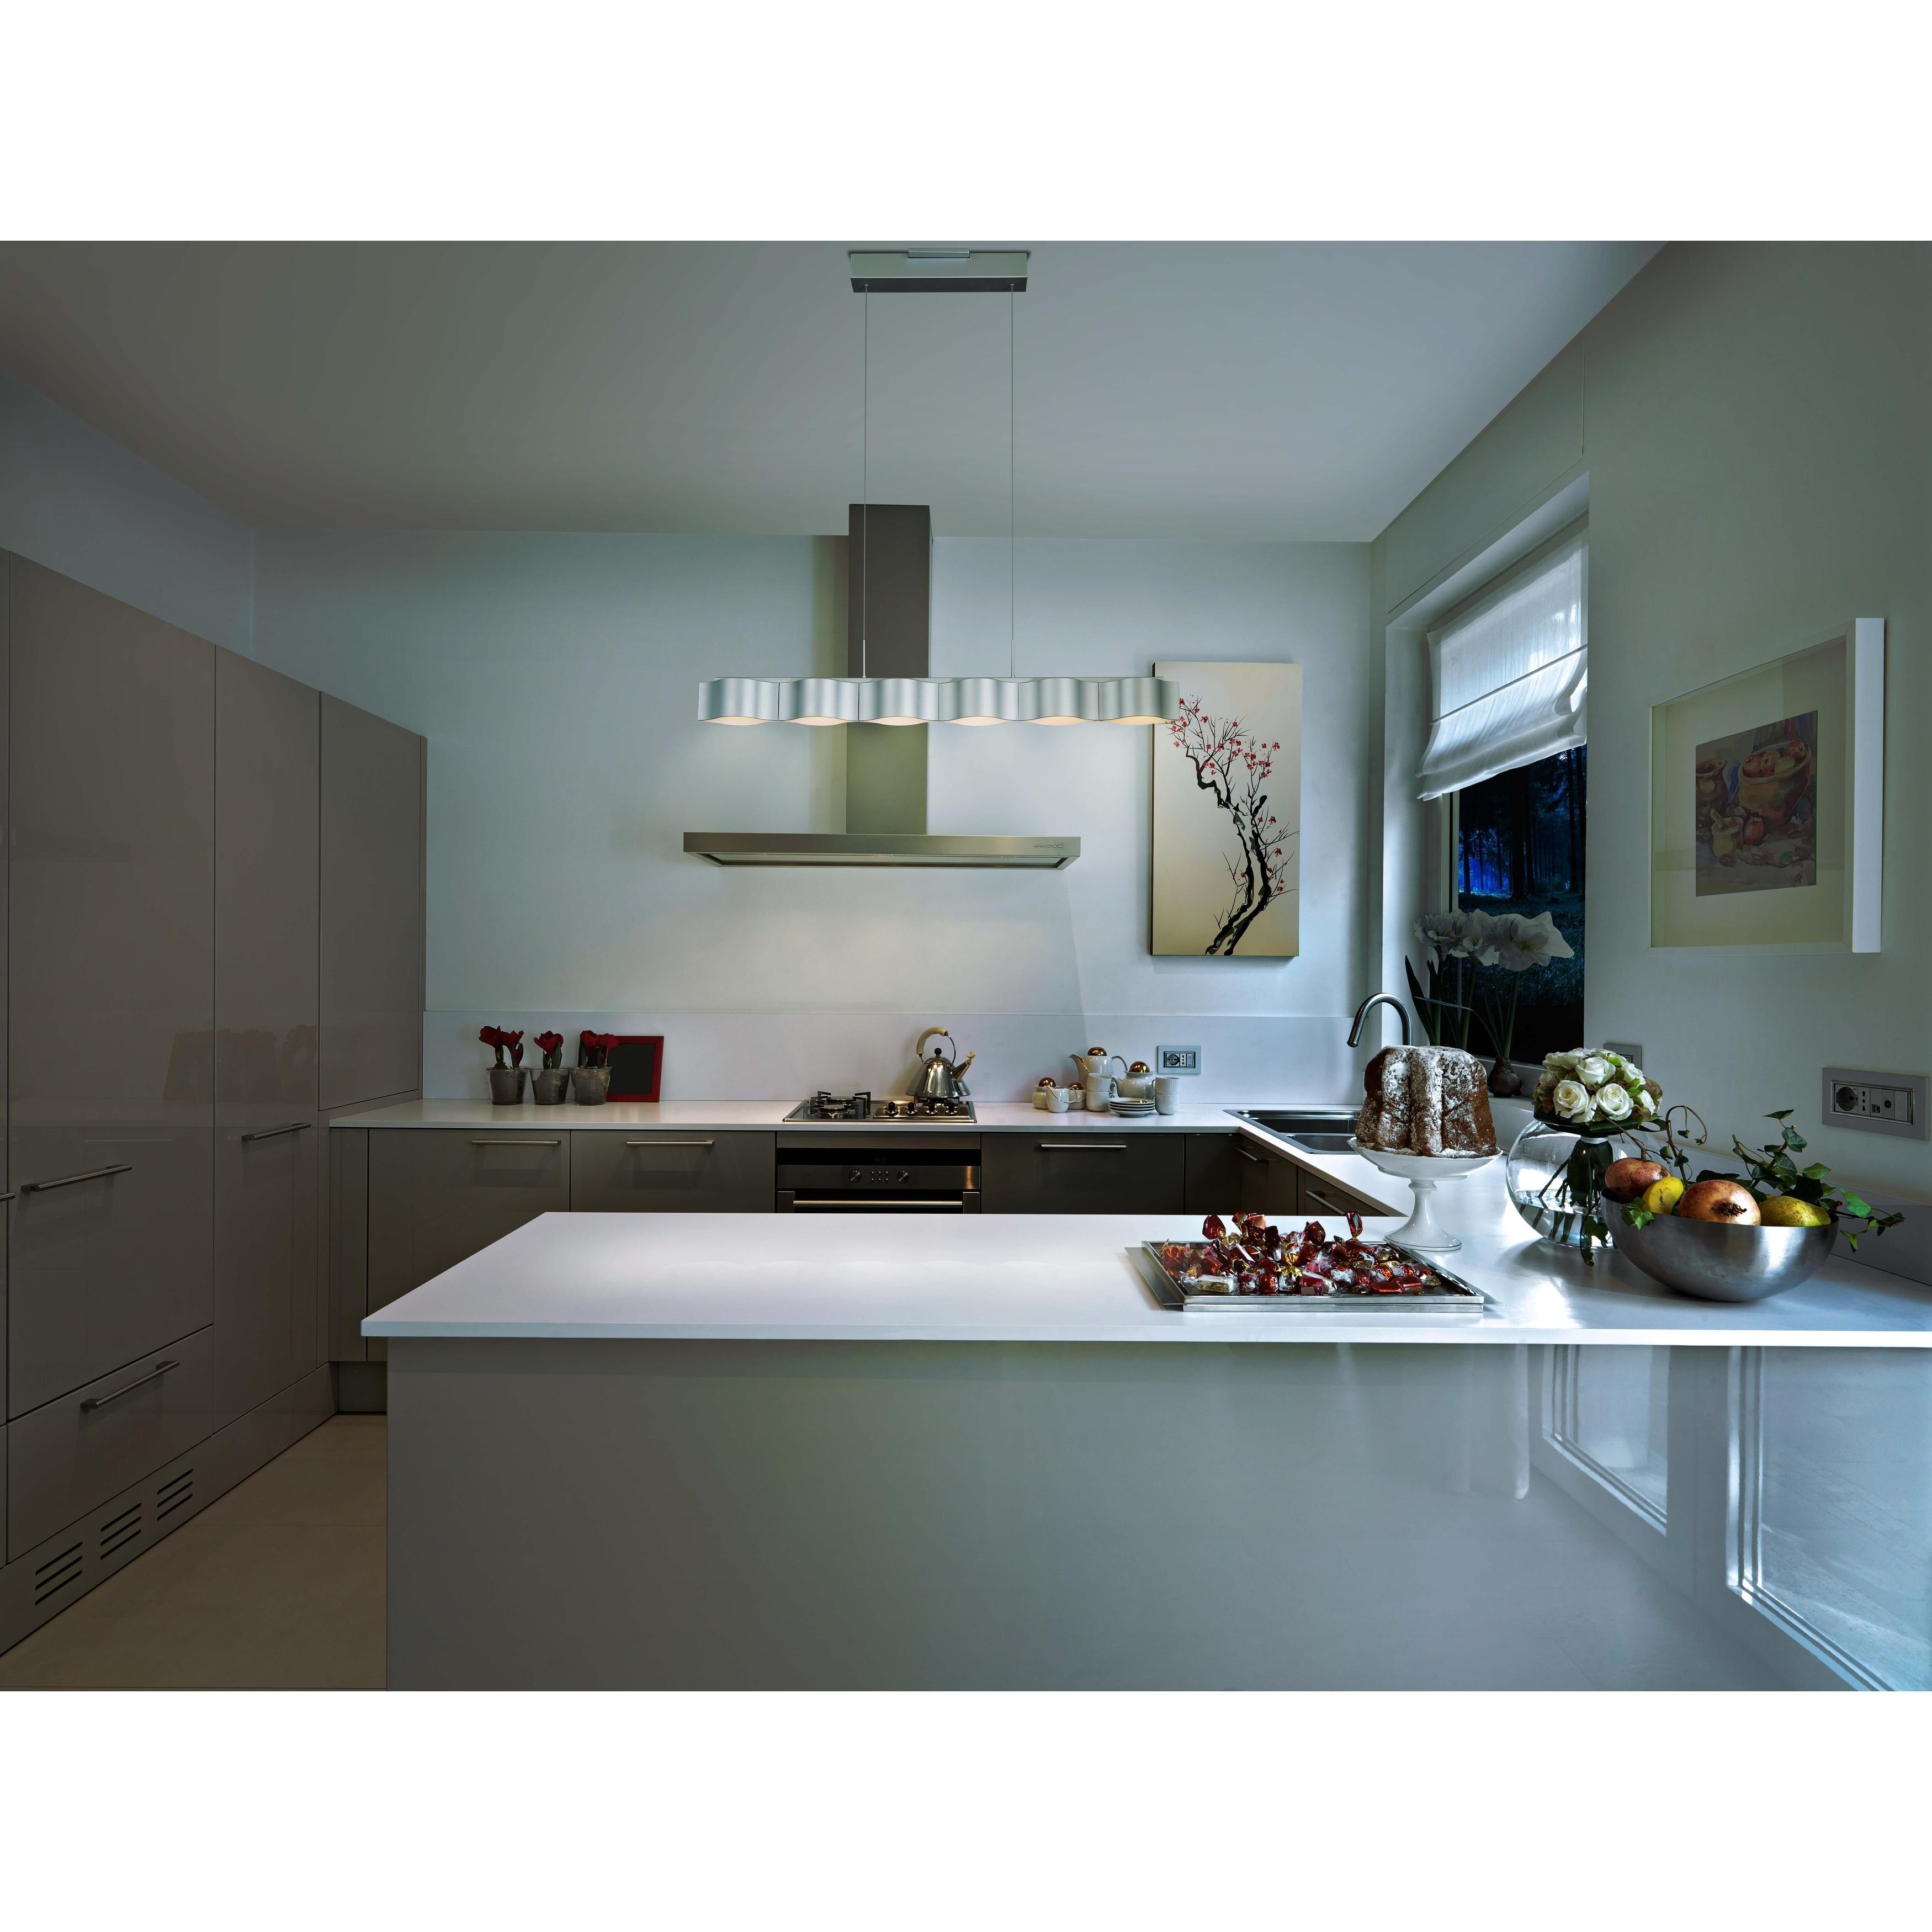 VONN Lighting VMC32100AL Asellus 38-inch LED Modern Linear ...